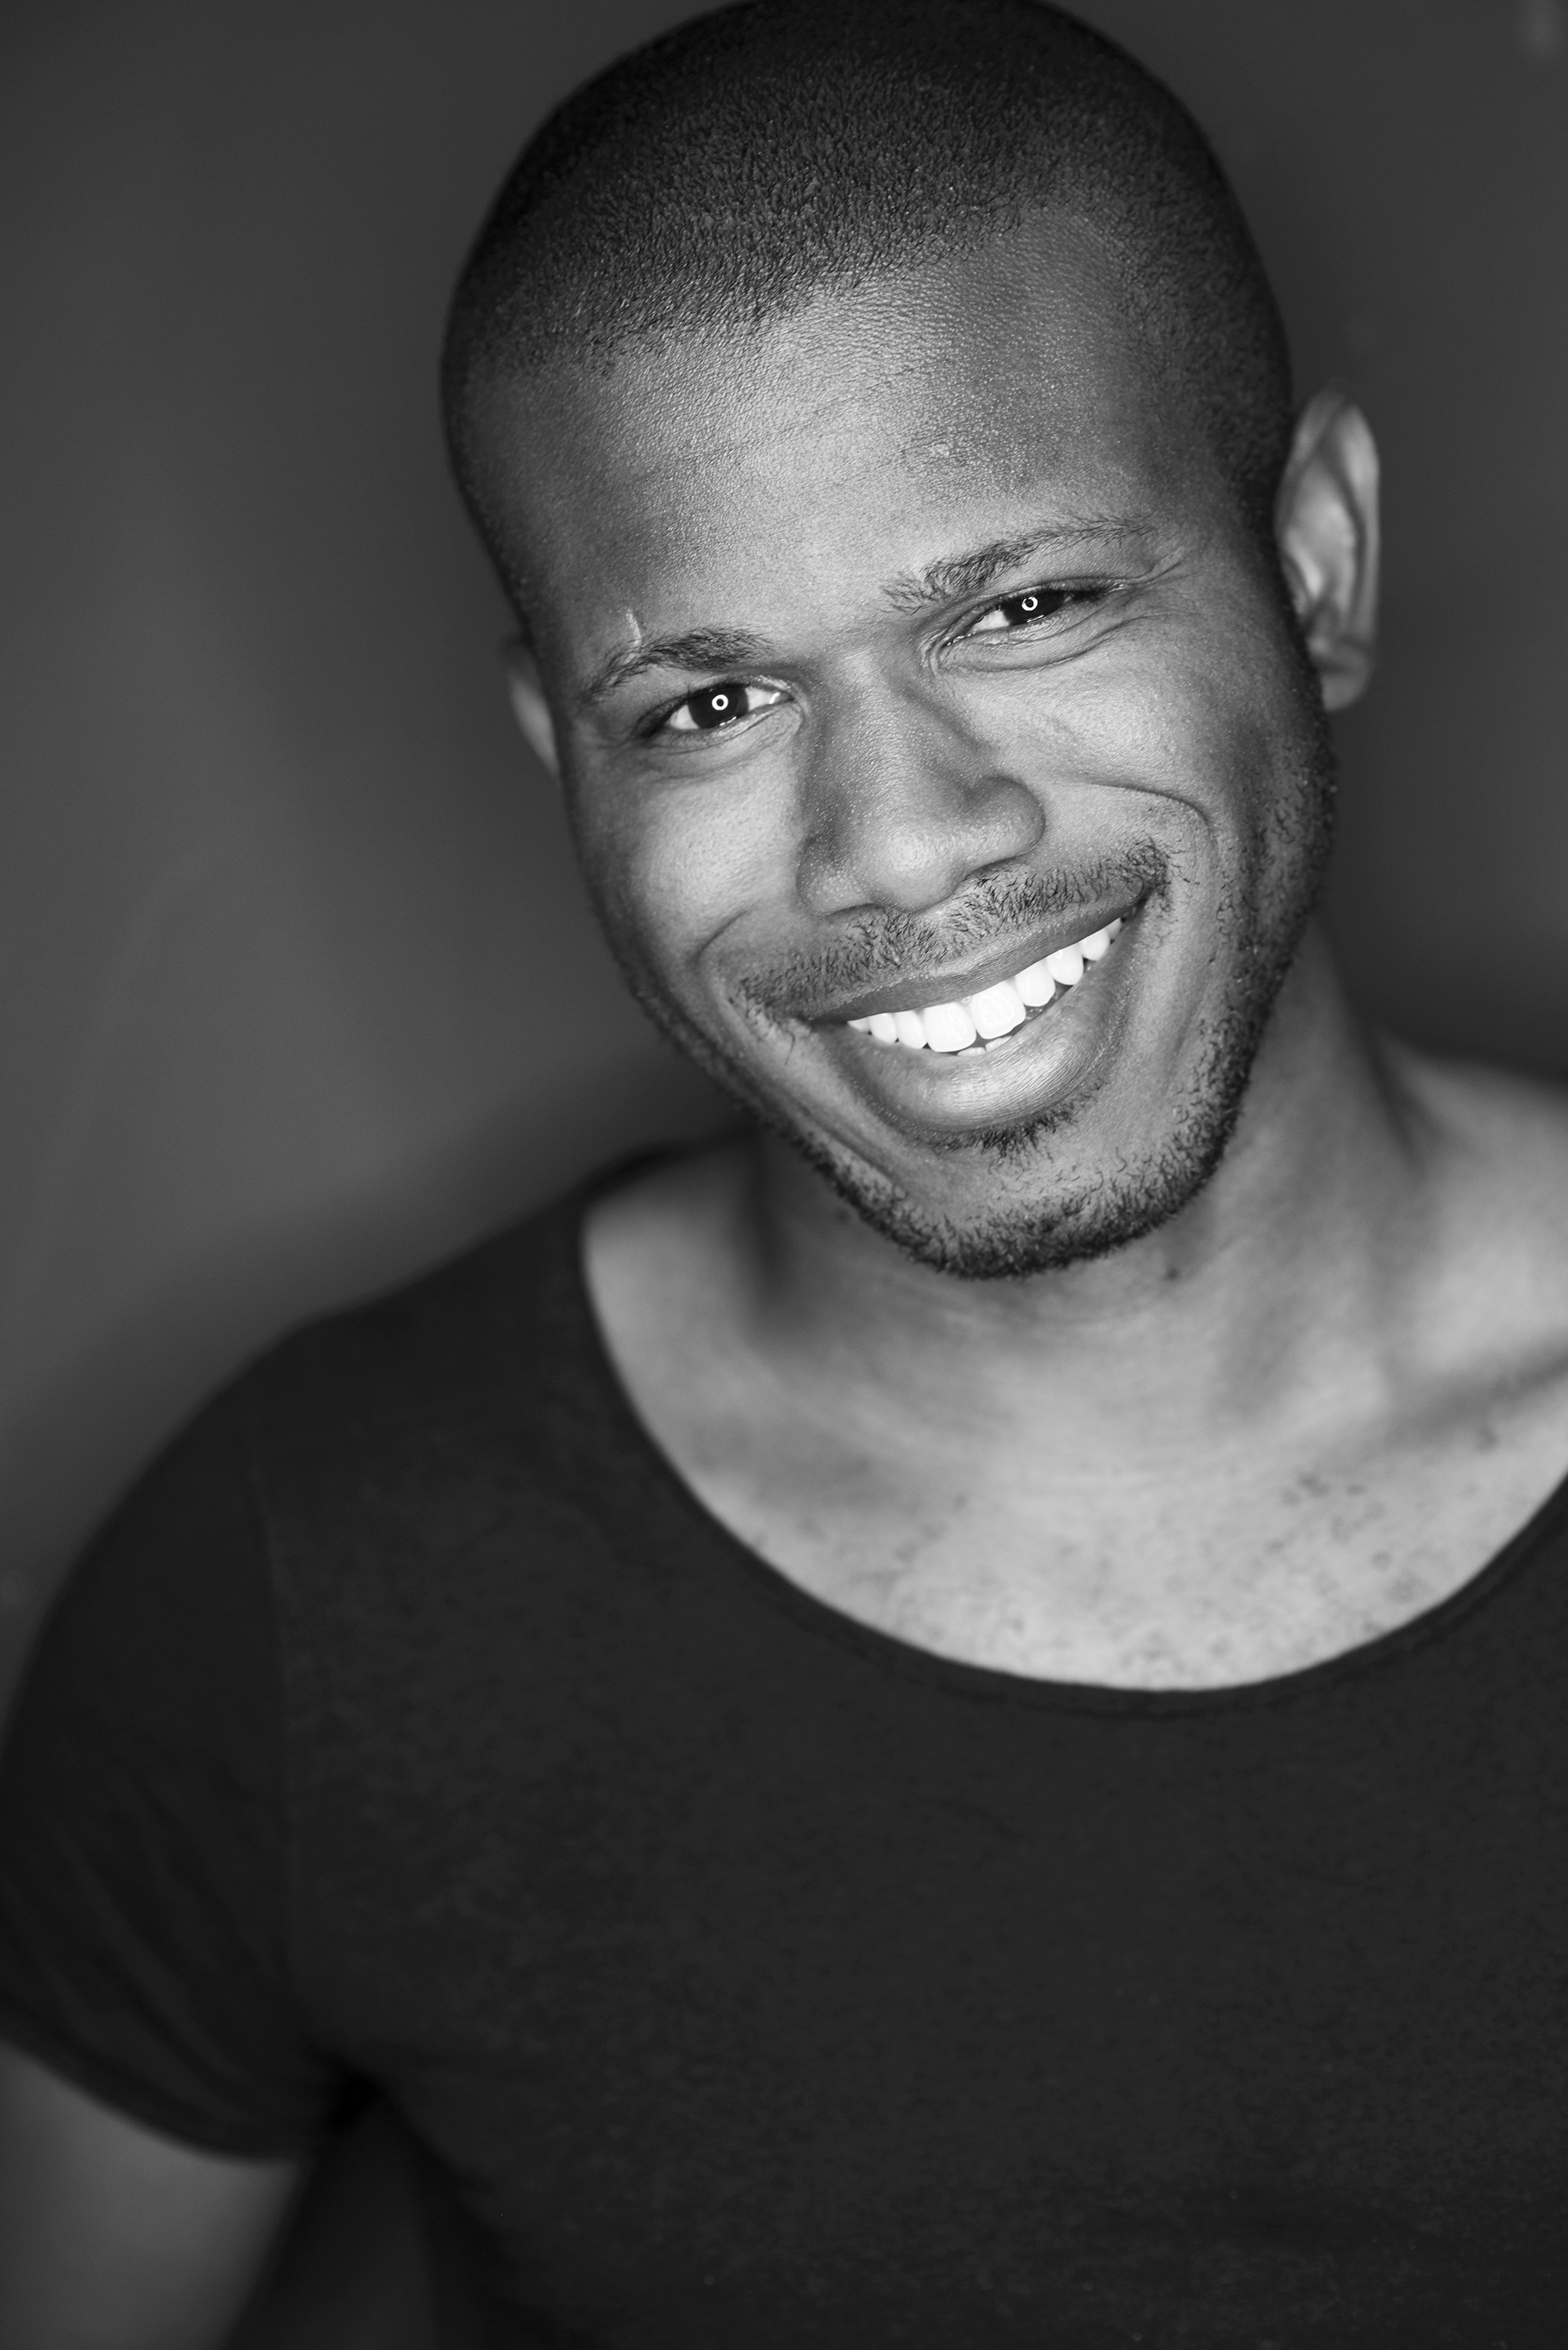 Cedric Terrell. Photographer. United States Marine.